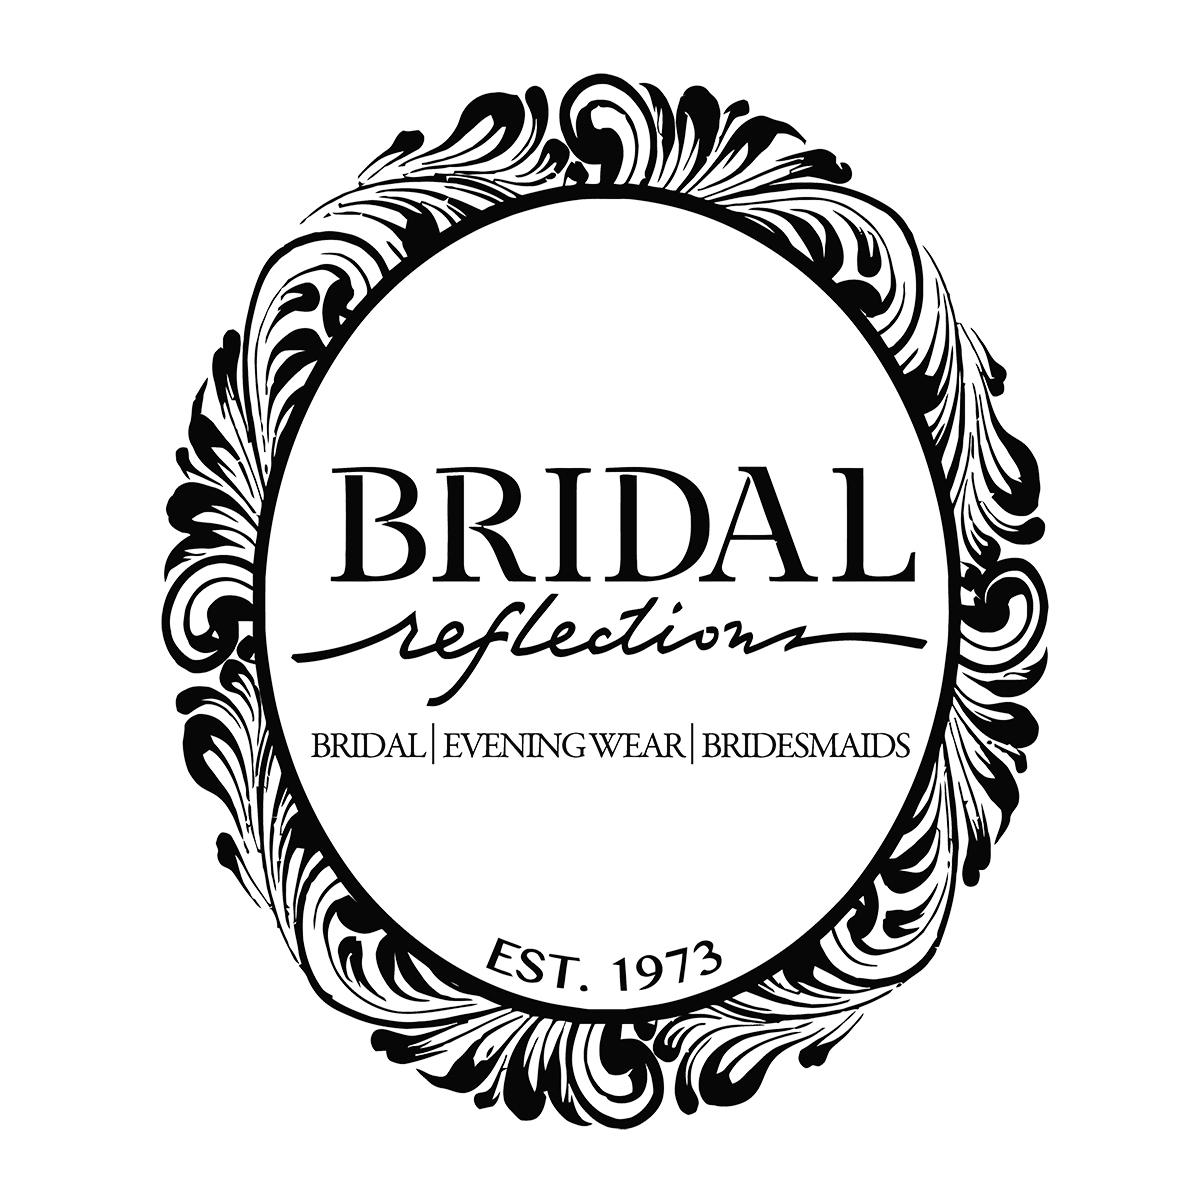 Bridal Reflections image 2